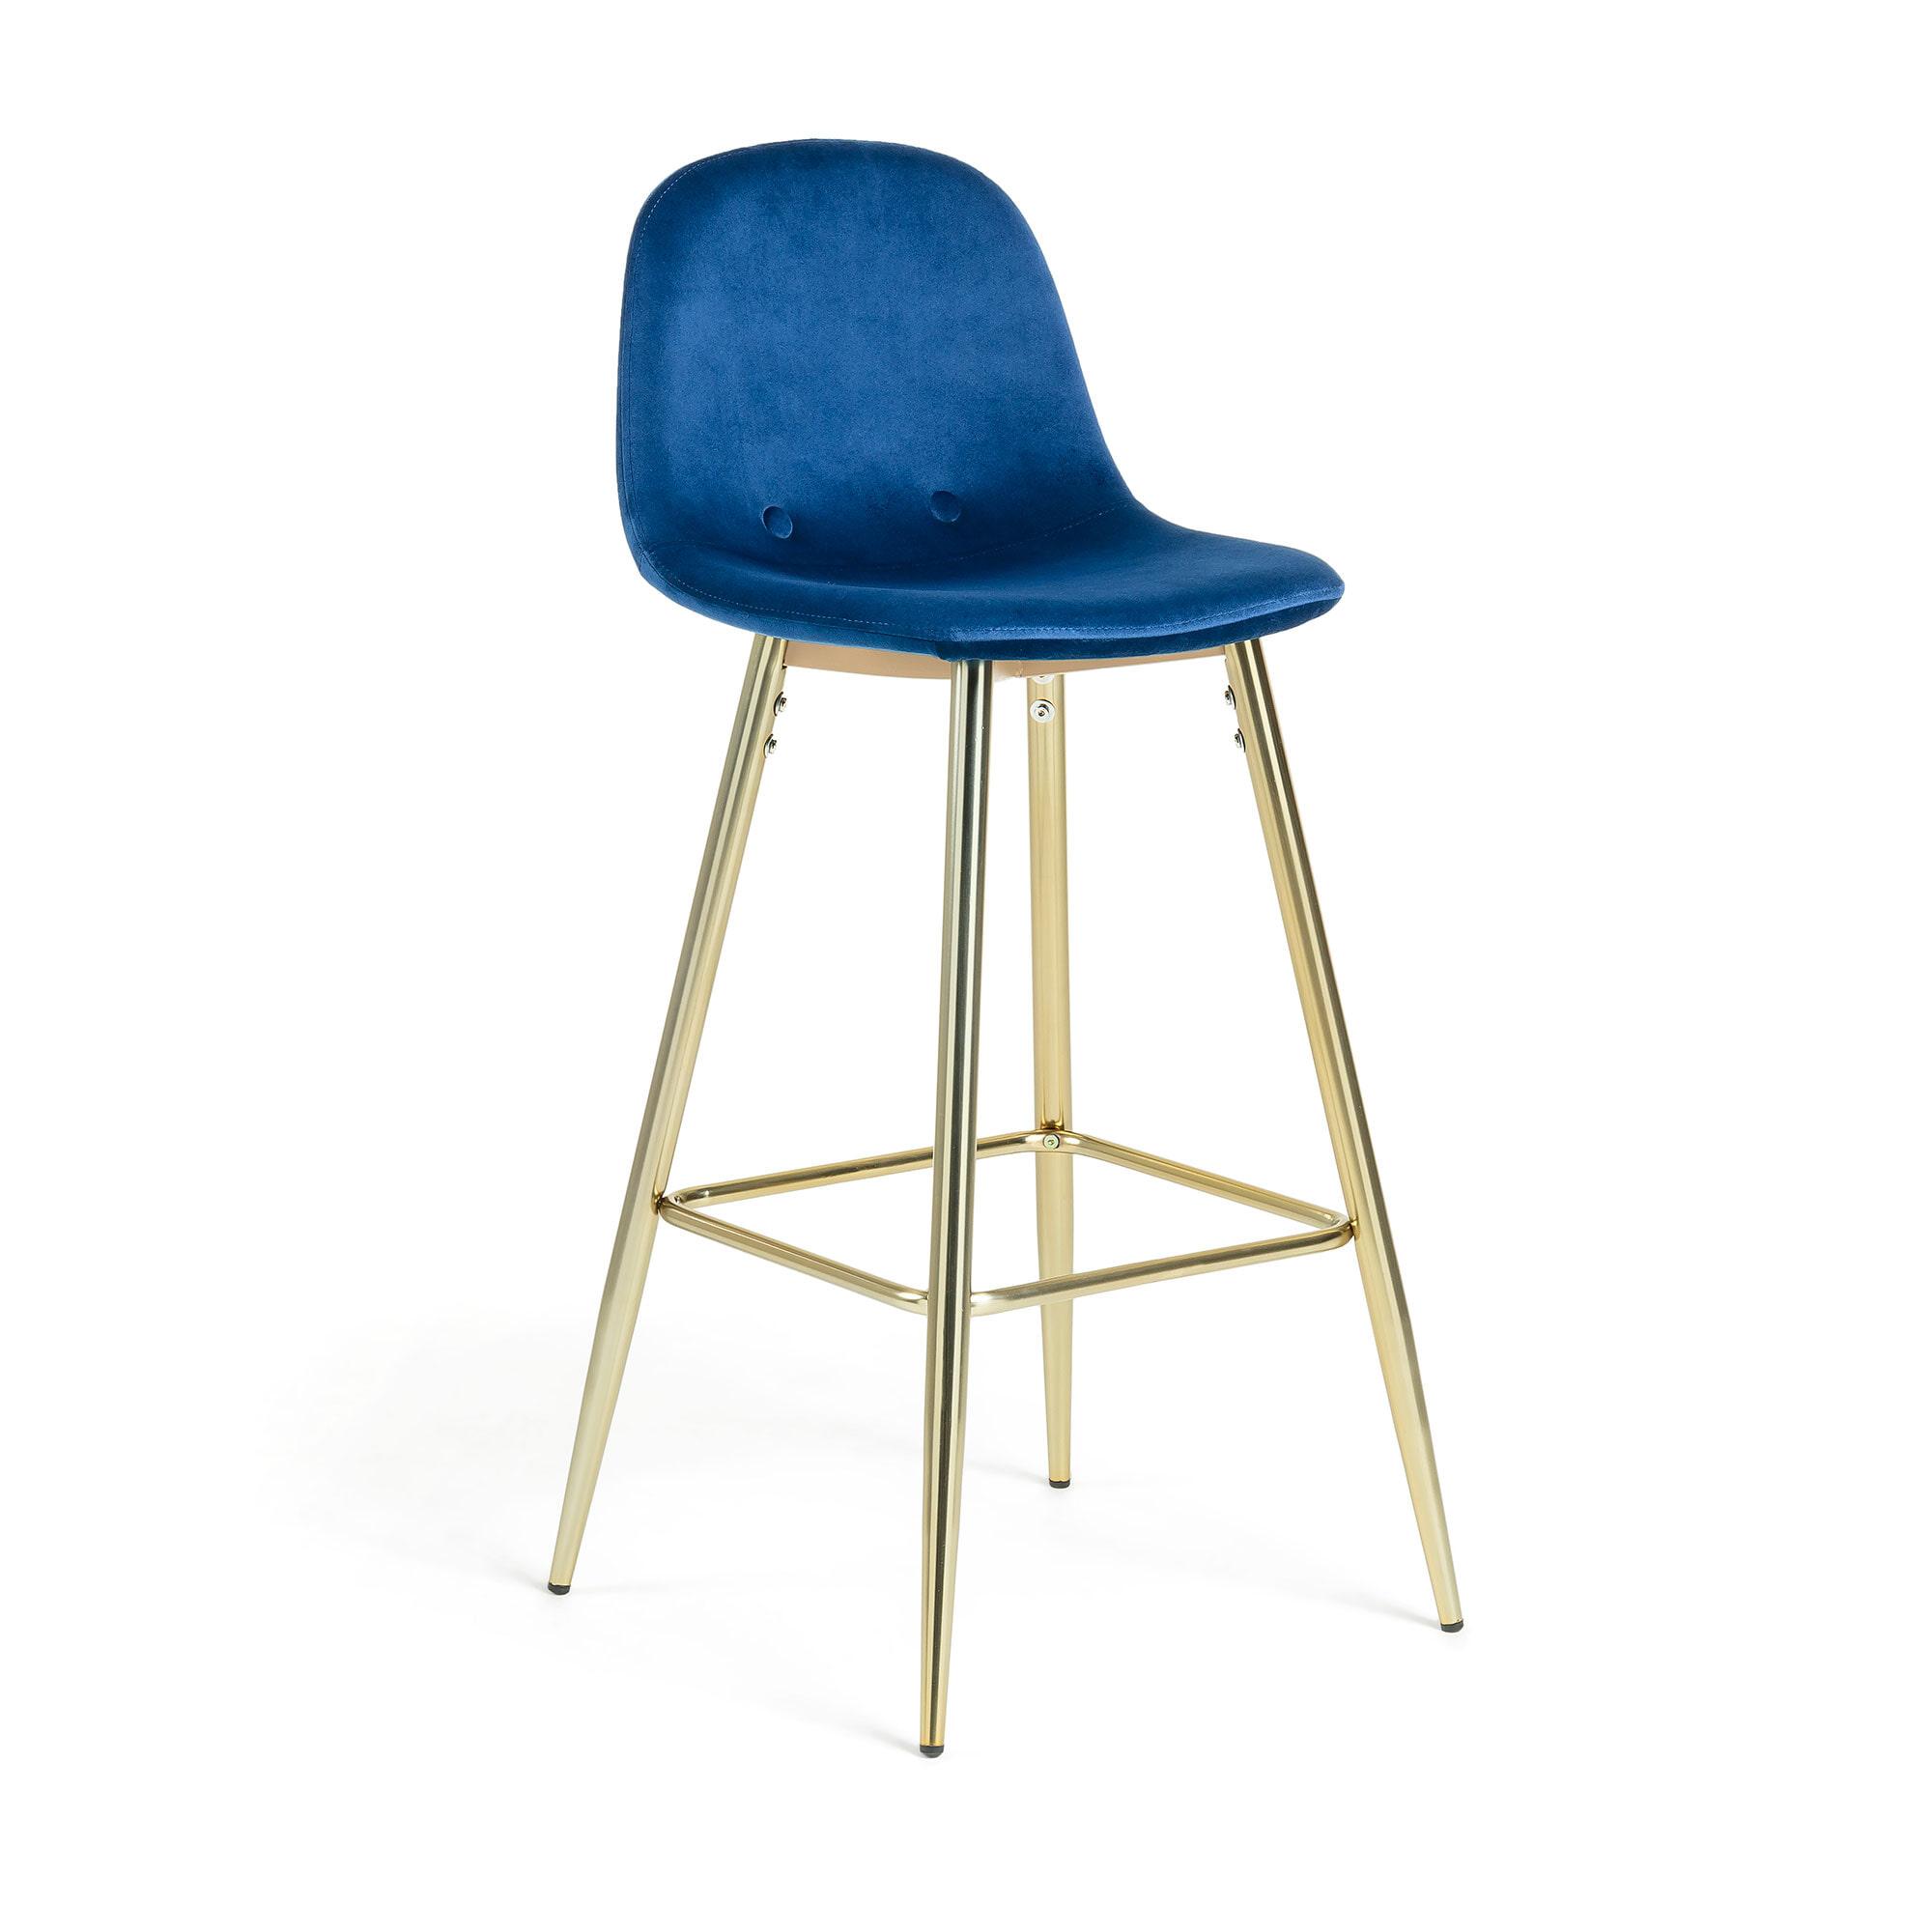 Kave Home Barkruk 'Nolite Gold' (zithoogte 75cm), kleur Donkerblauw